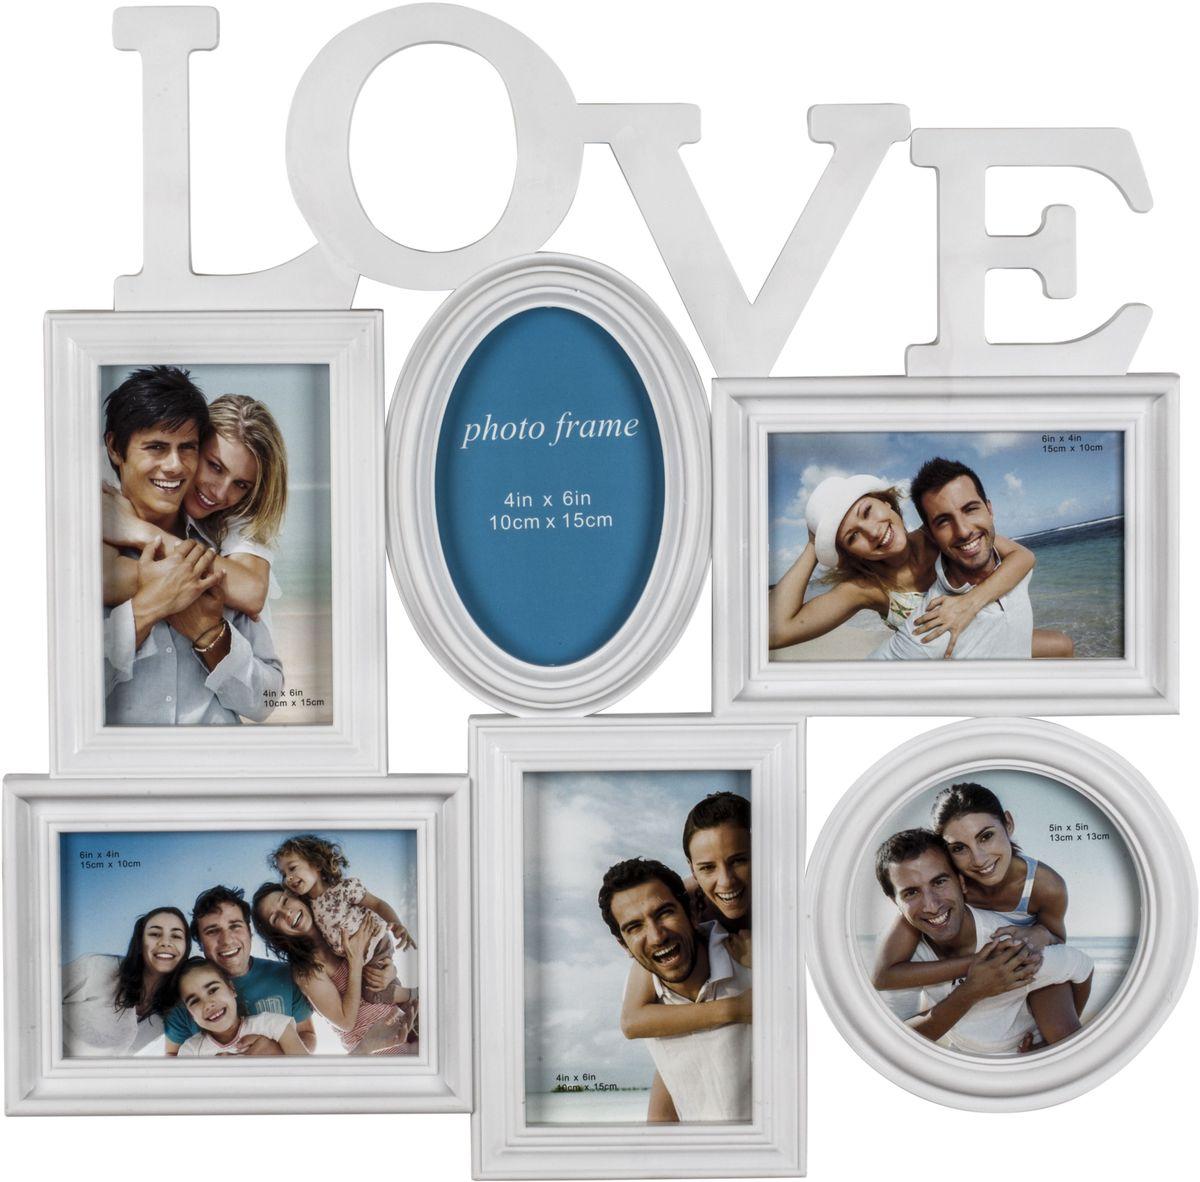 Коллаж Platinum Love, цвет: белый, 6 фоторамок. BH-1406PLATINUM BH-1406-White-БелыйПластиковый коллаж с 5 фото 10х15 см, 1 фото 13х13 см.